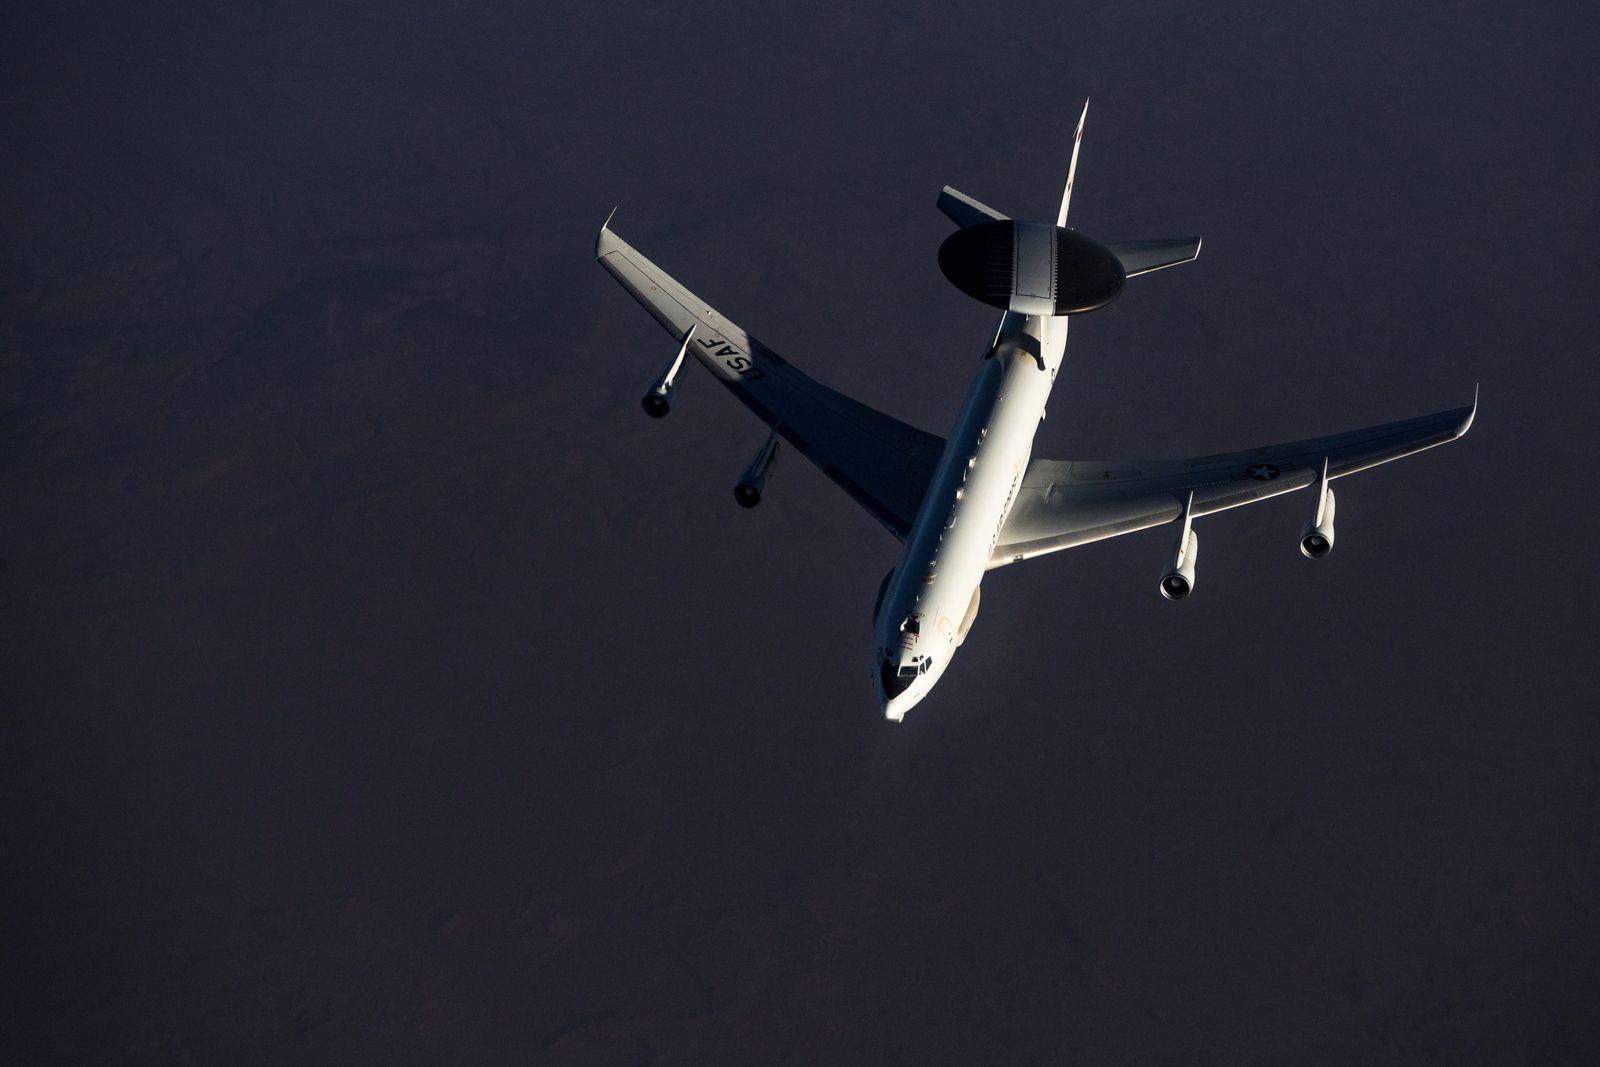 US Air Force/ E-3 Sentry/ AWACS